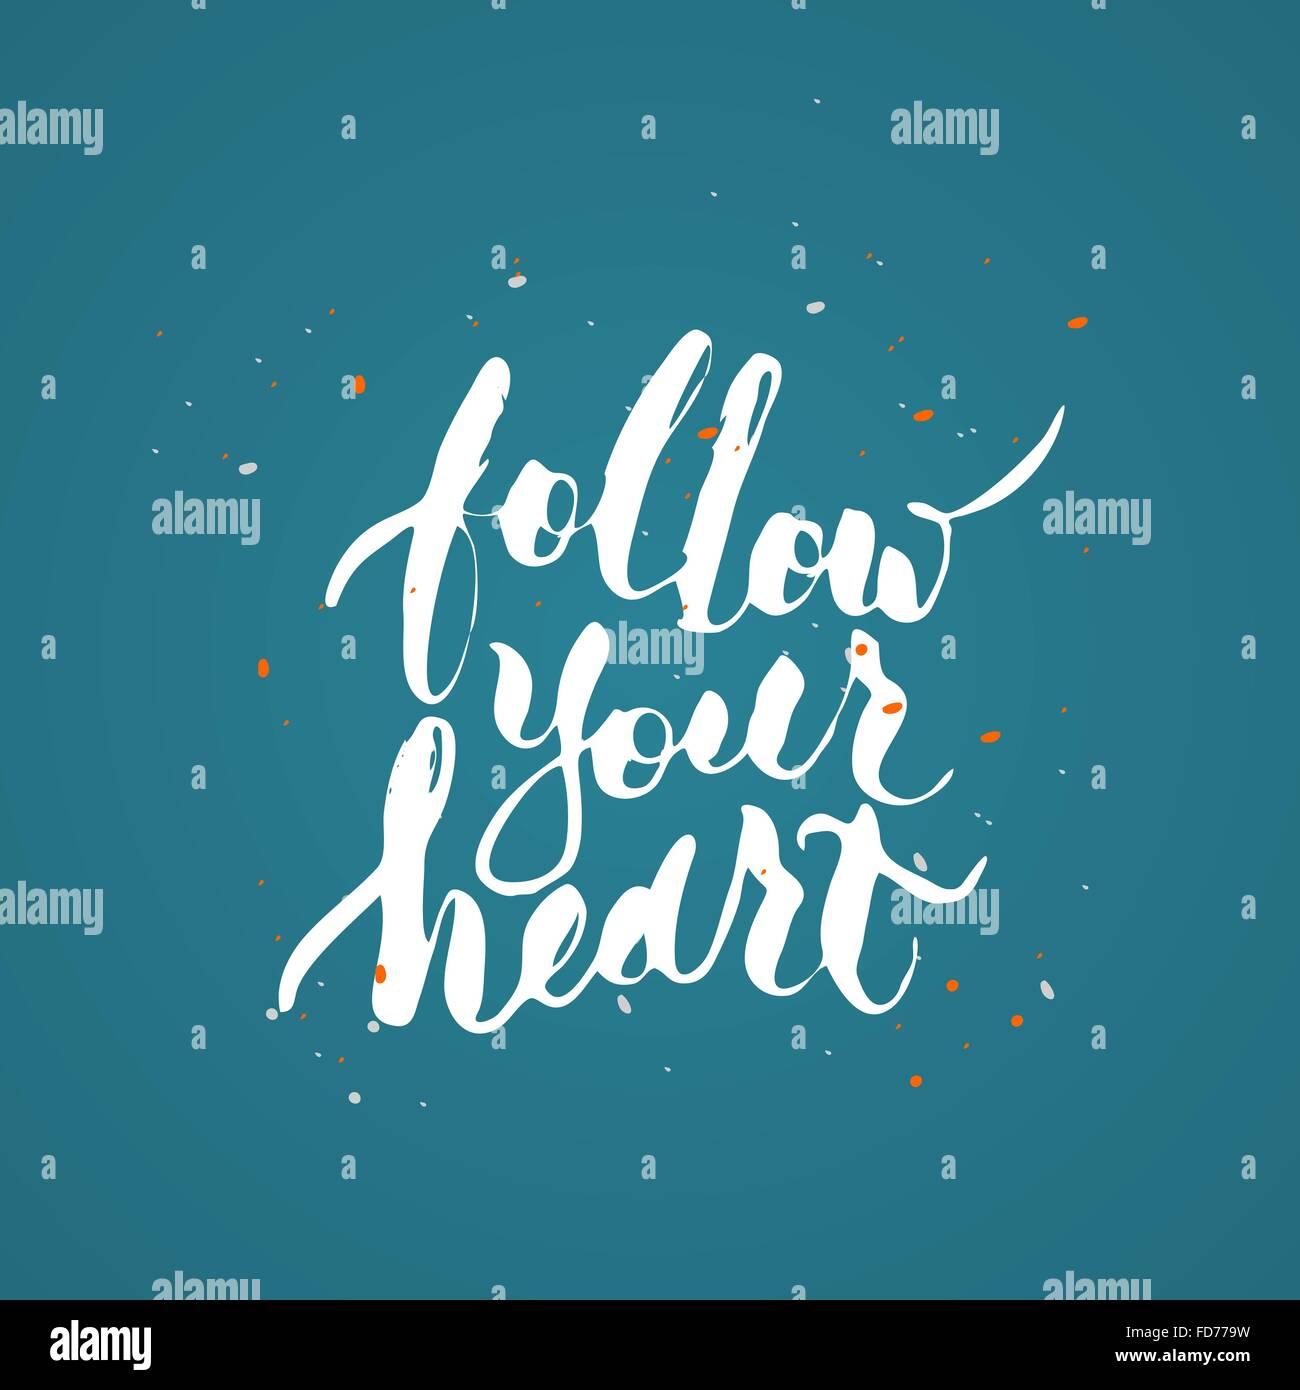 Follow Your Heart Stock Photos & Follow Your Heart Stock Images - Alamy